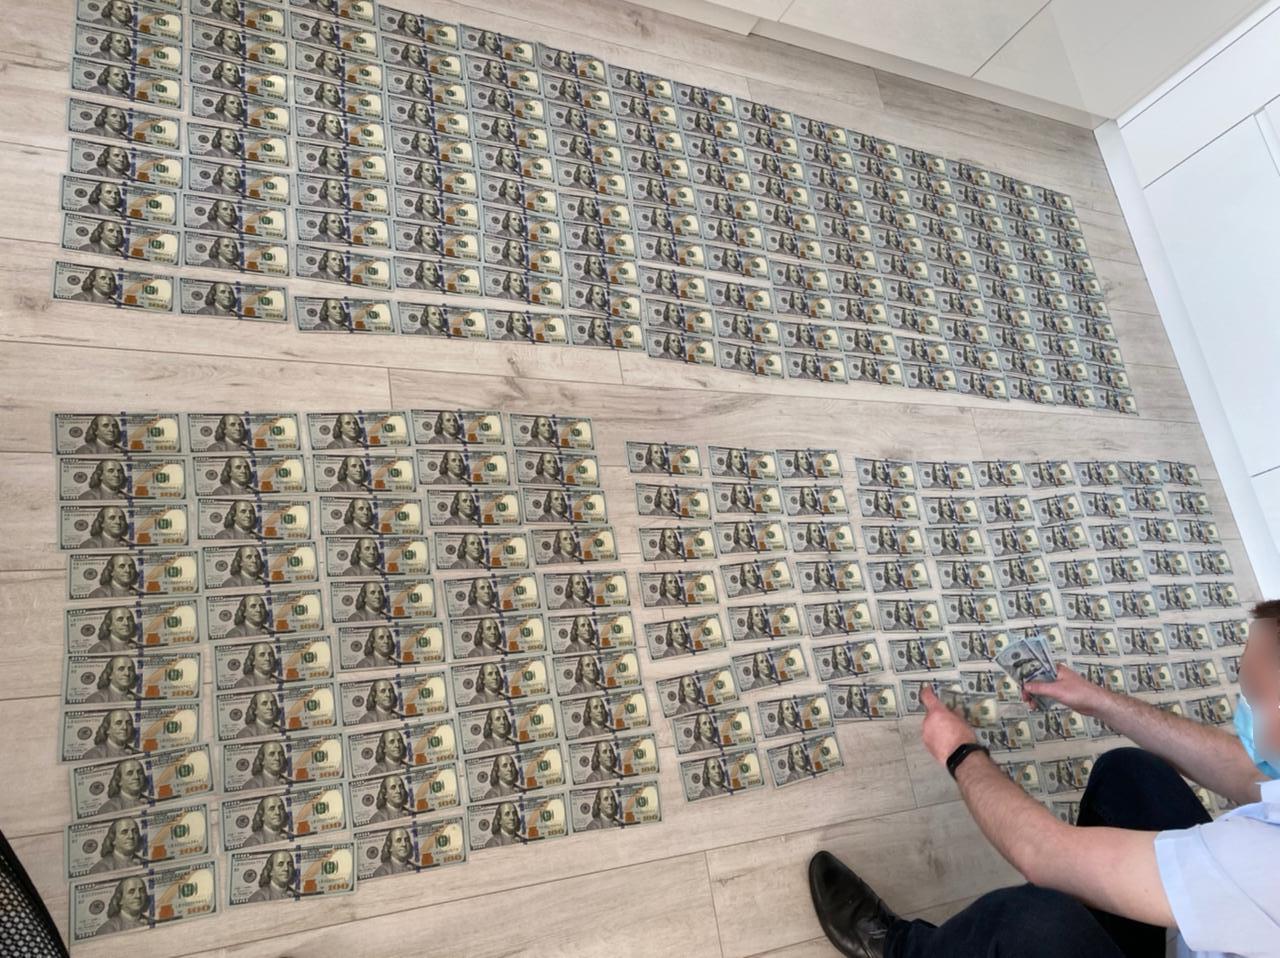 US 100 dollar bills on the ground